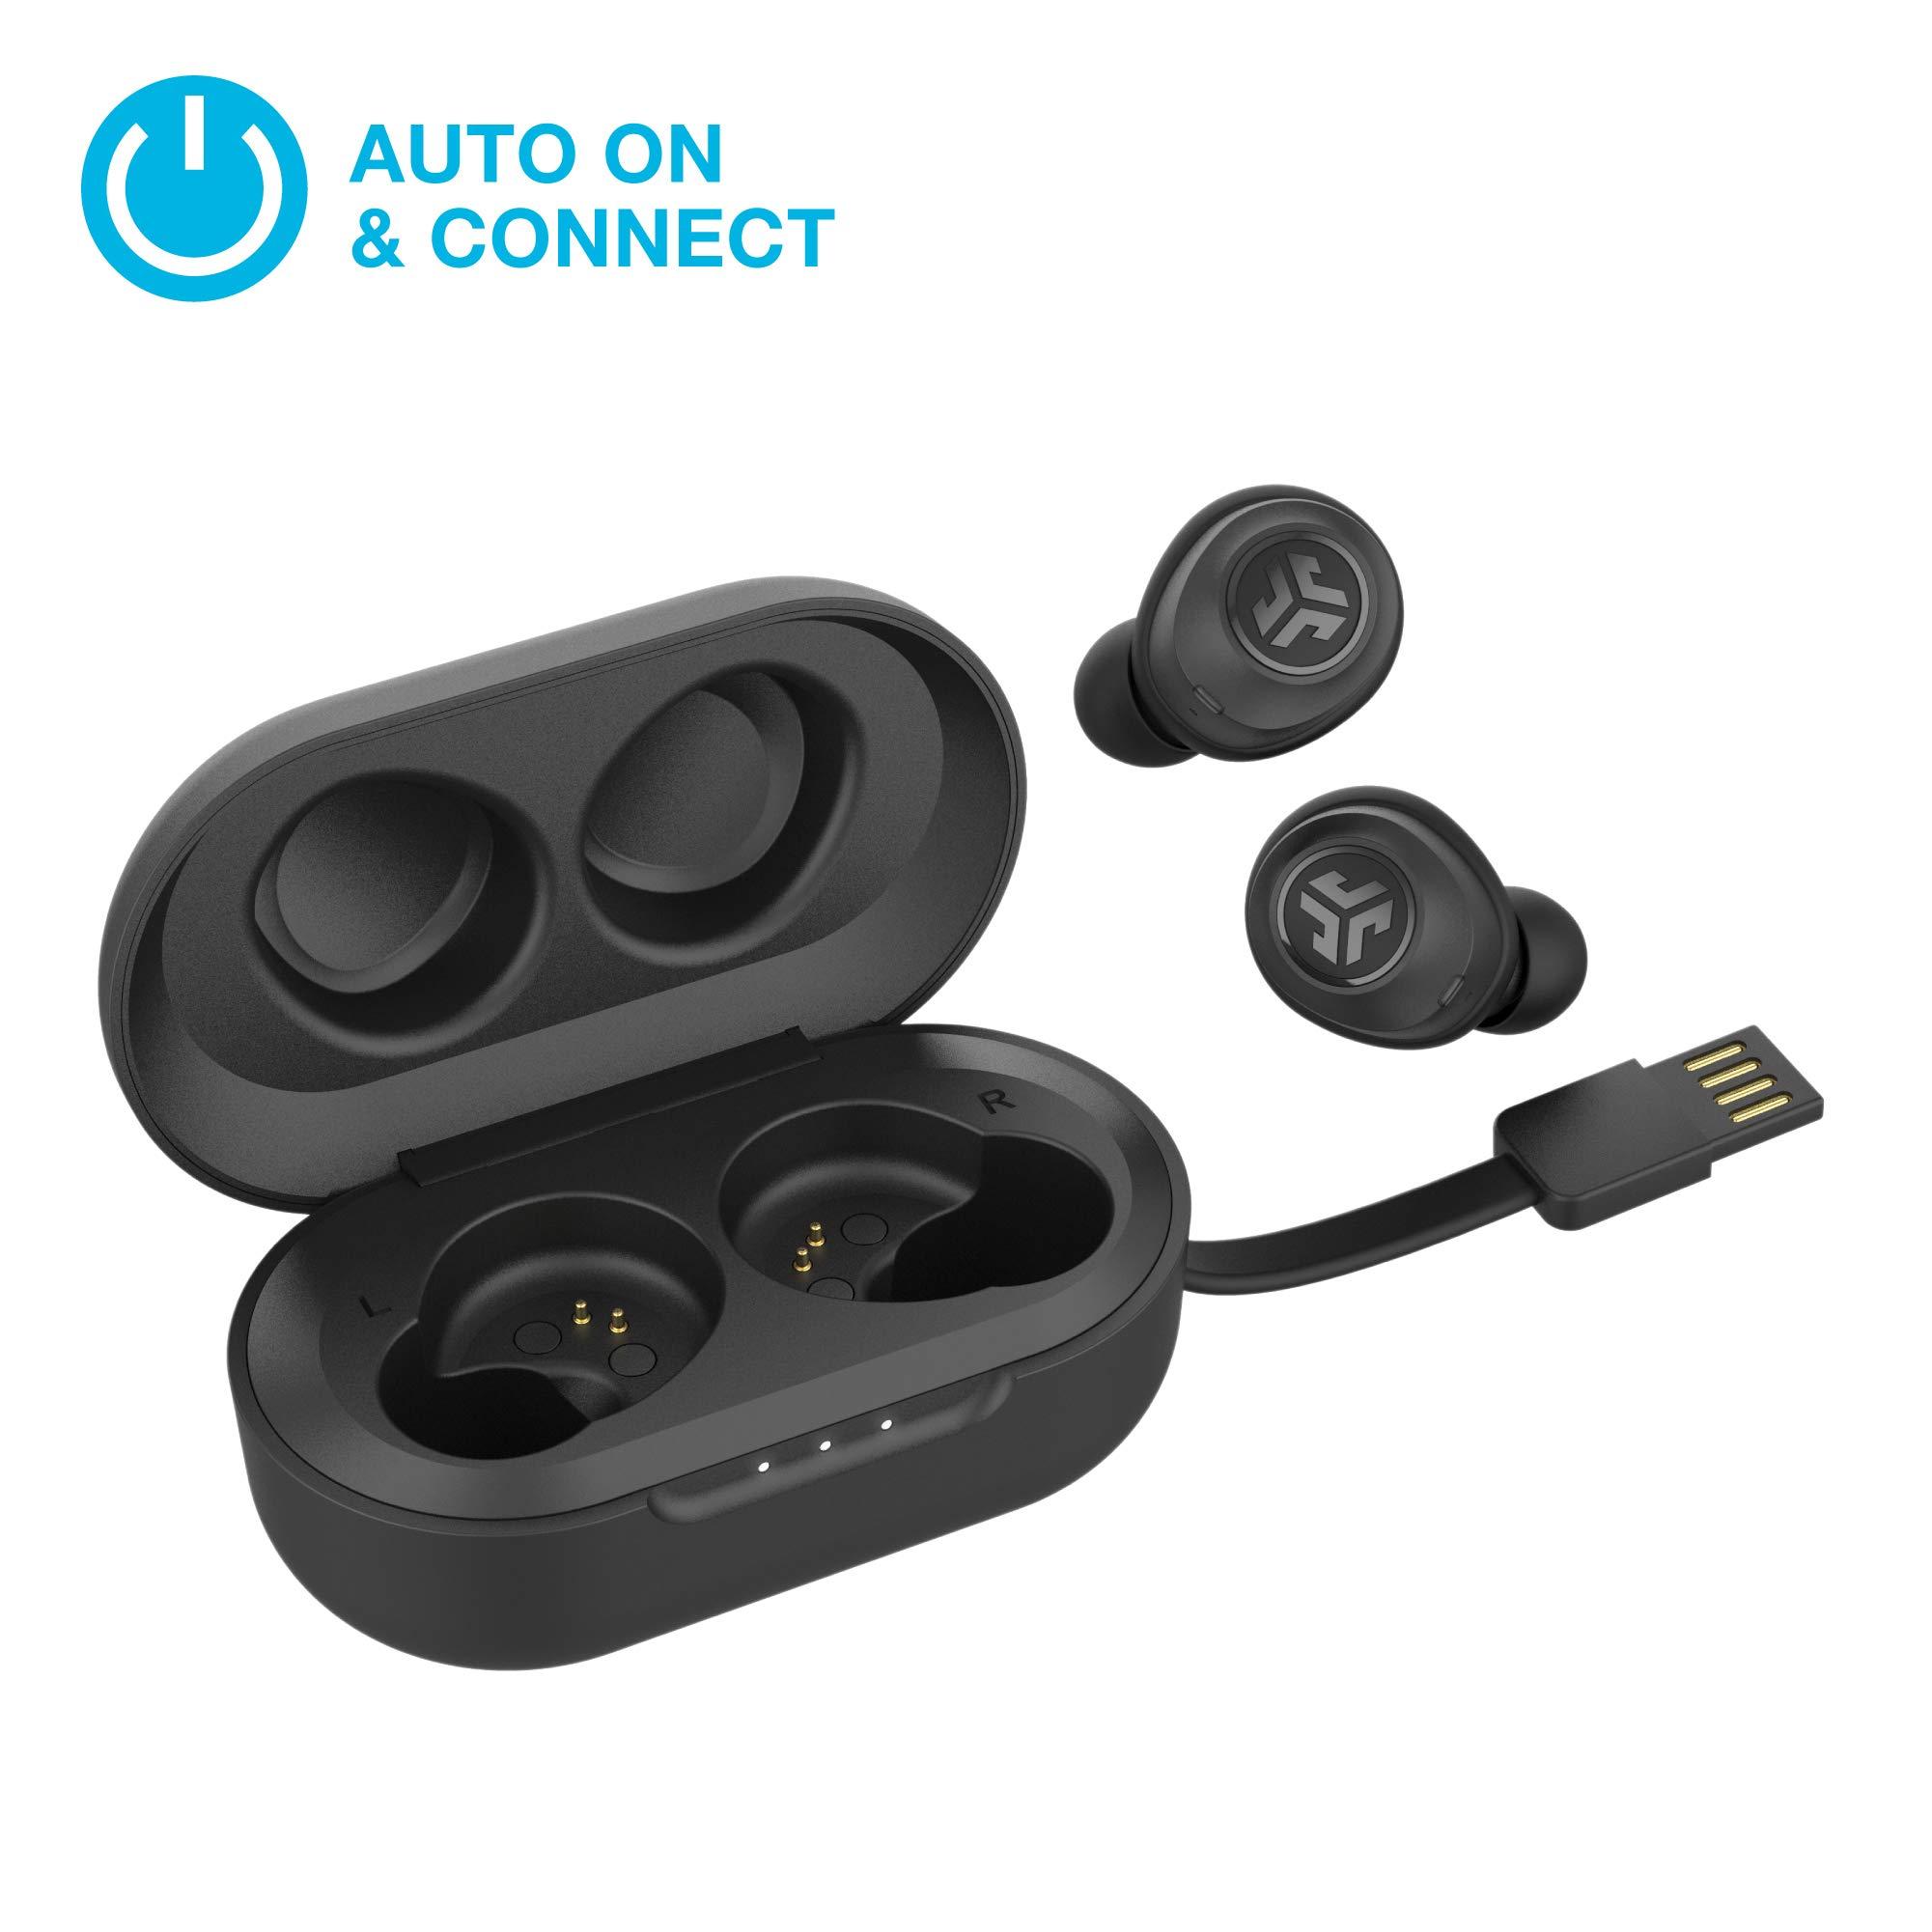 JLab Audio JBuds Air True Wireless Signature Bluetooth Earbuds + Charging Case - Black - IP55 Sweat Resistance - Bluetooth 5.0 Connection - 3 EQ Sound Settings: JLab Signature, Balanced, Bass Boost by JLAB (Image #2)